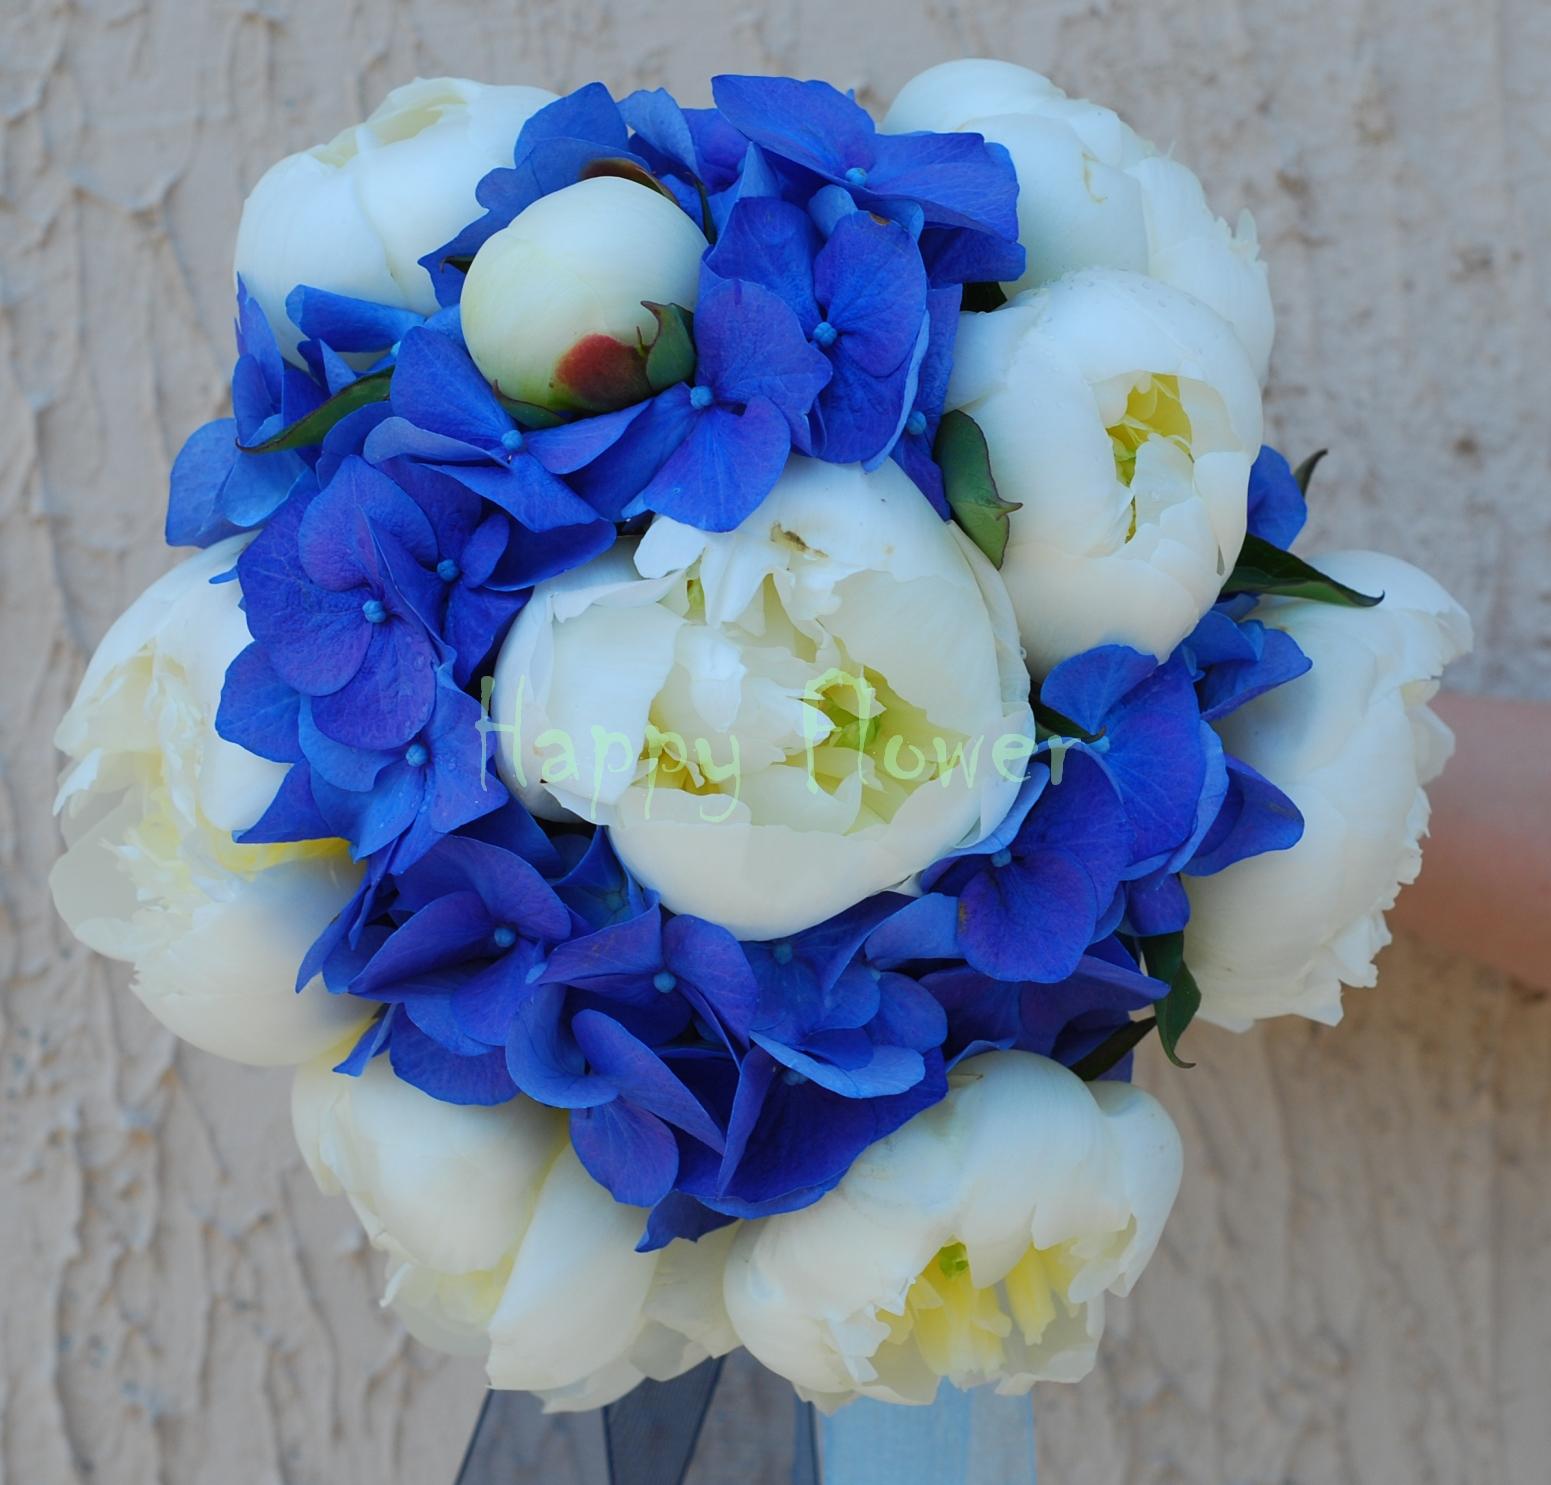 Buchet Mireasa Hortensie Albastra Si Bujori Albi Happy Flower